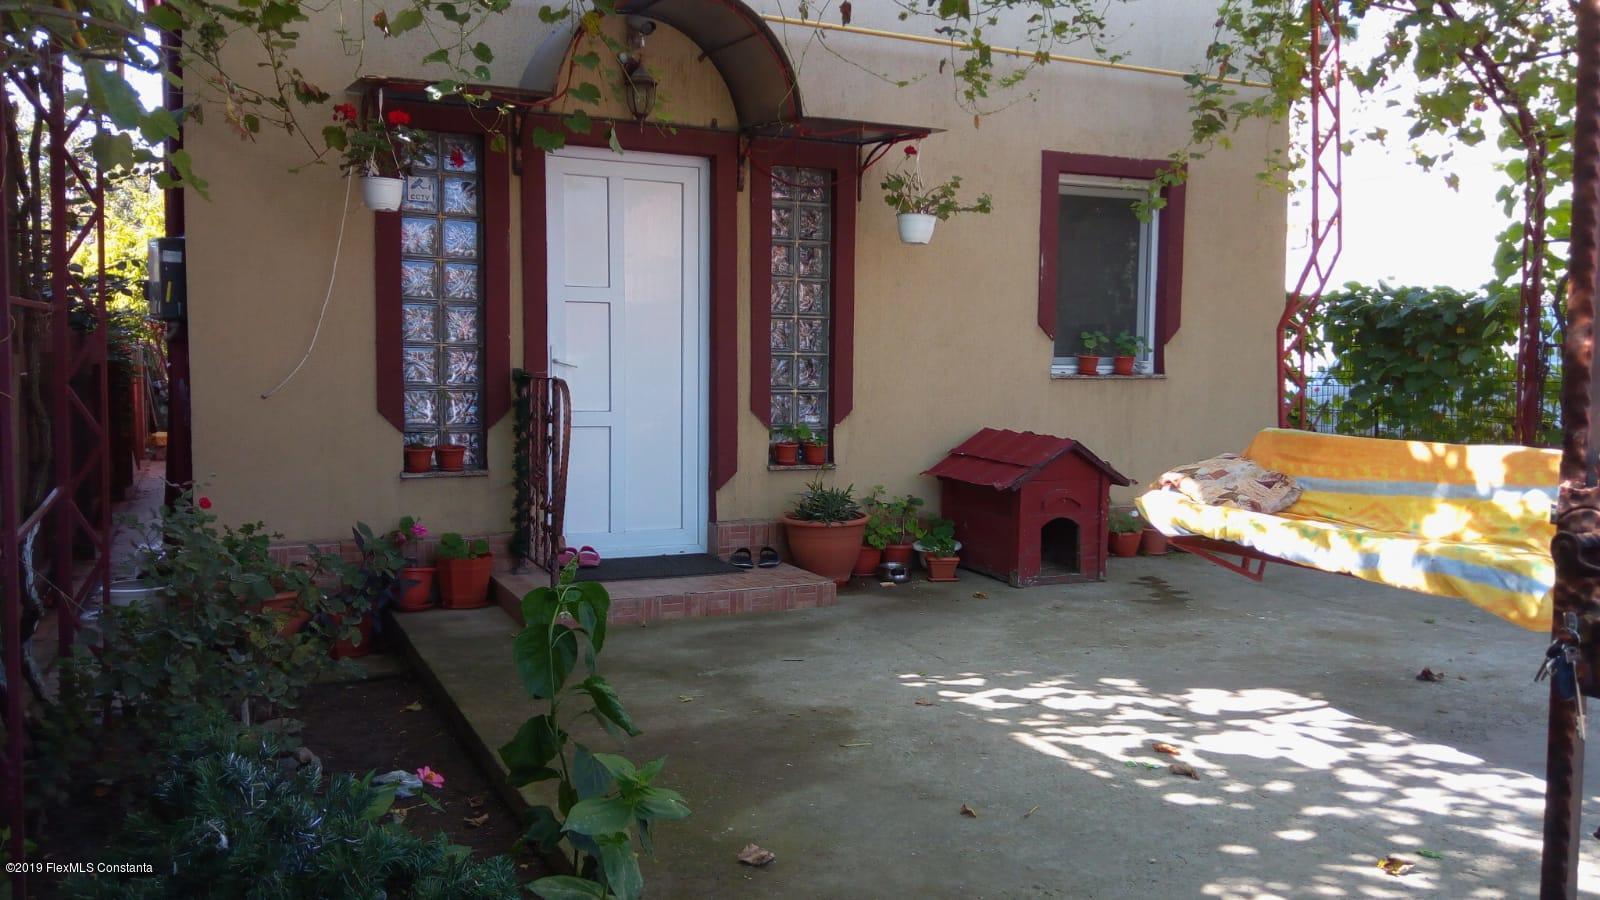 Vanzare Casa 125 m² - Centru, Lumina